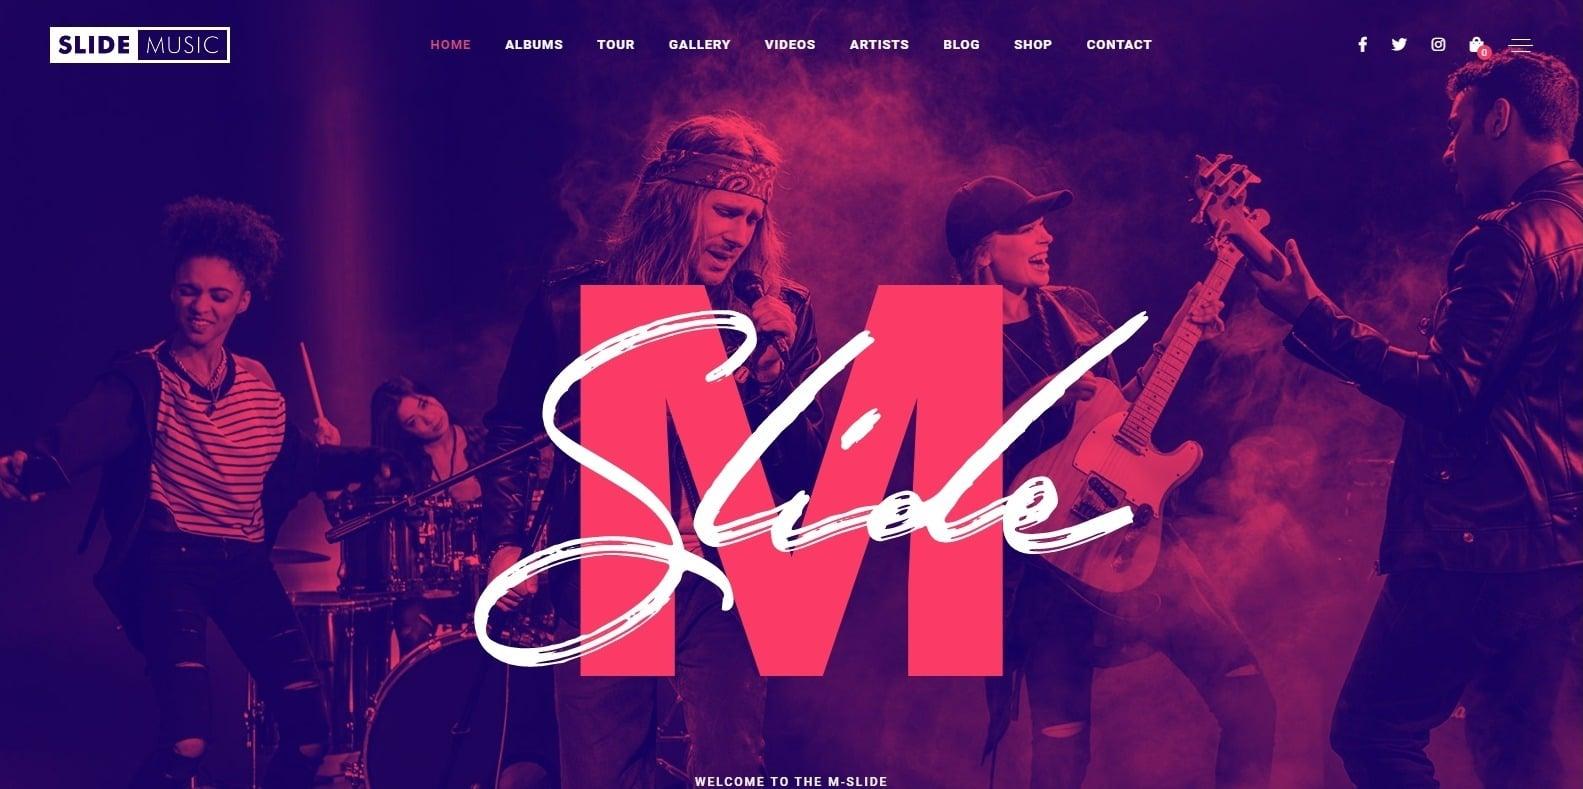 slide-music-recording-studio-website-template